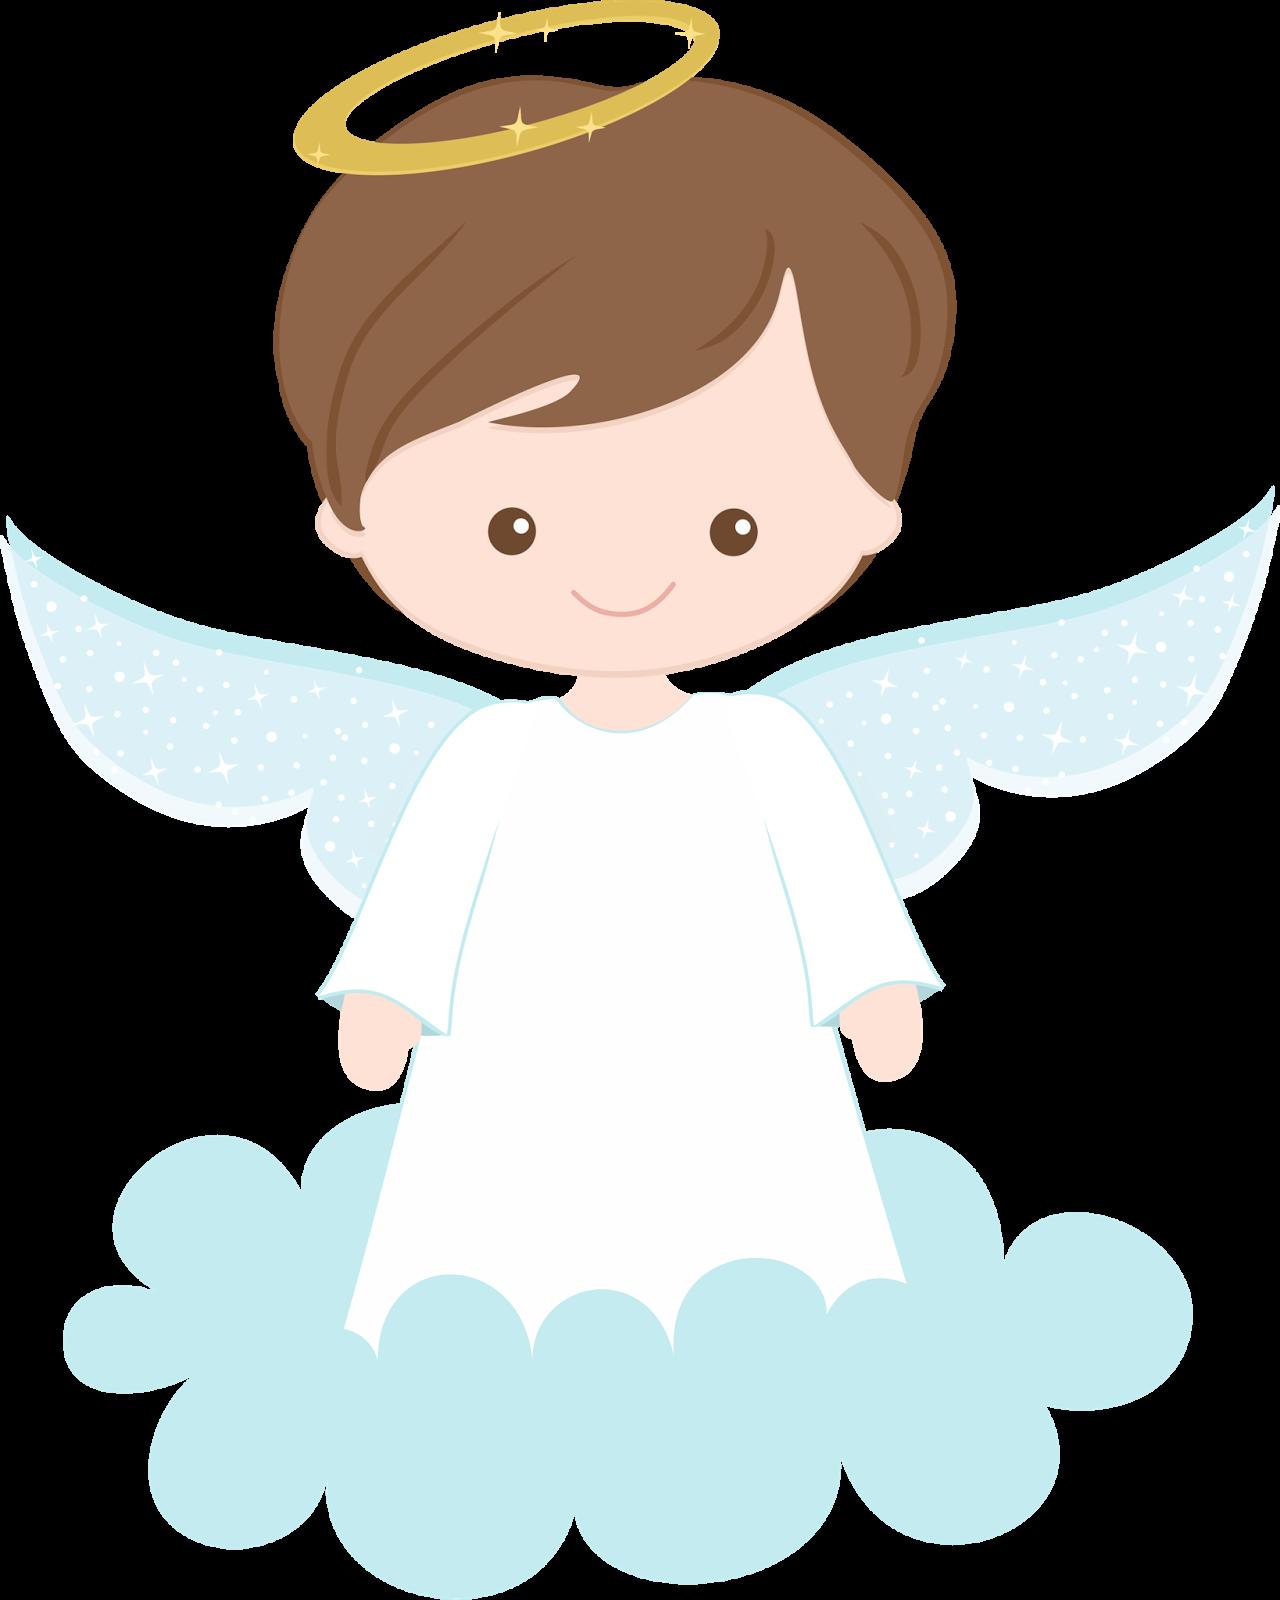 Communion clipart child. Ibnxf c dvygf png